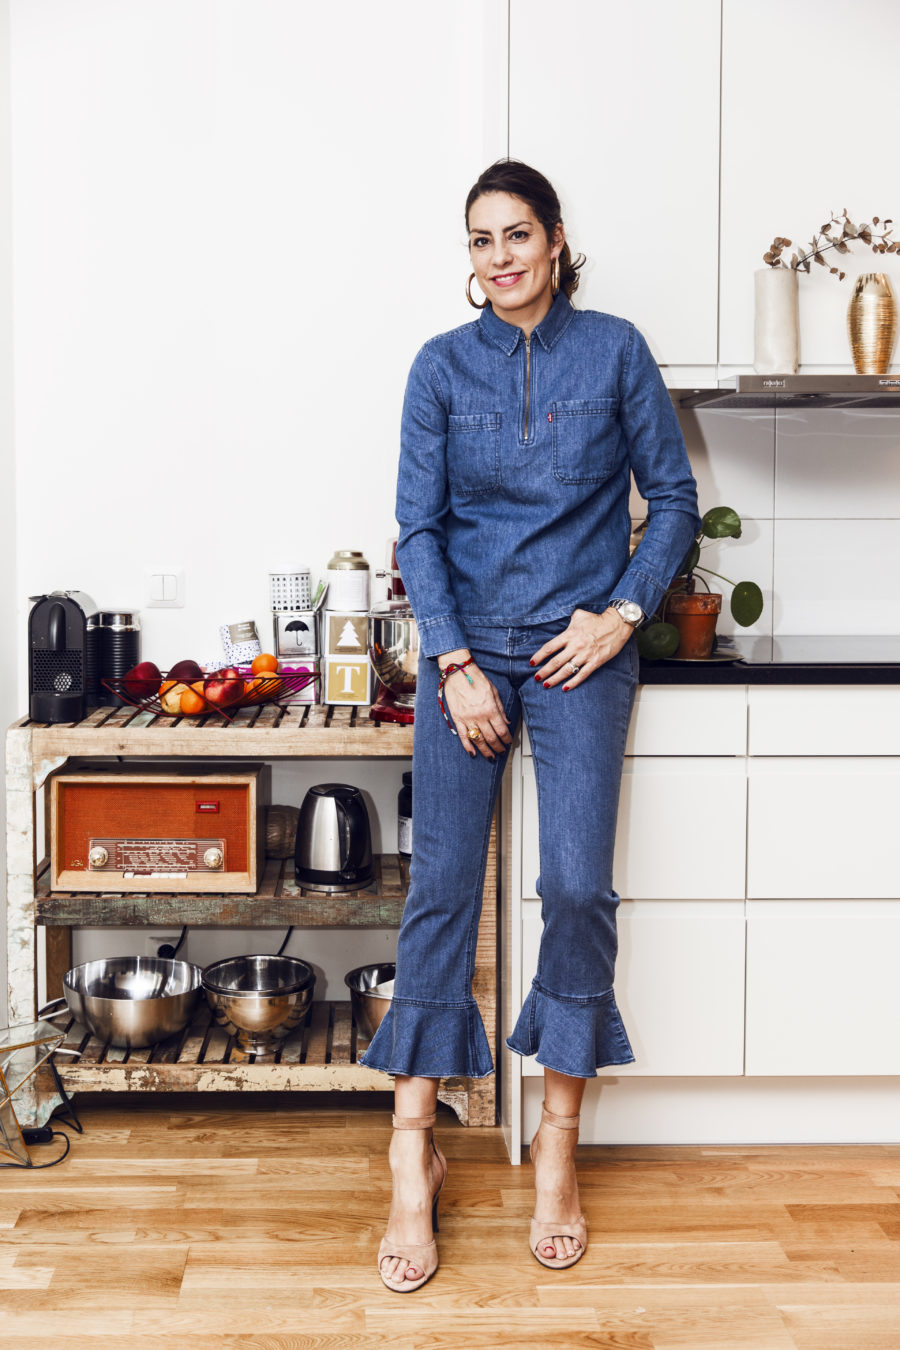 Nina Campioni ootd outfit of the day, jeans saint tropez, skjorta levis, skor billi bi, modebloggare elle sverige, örhängen H&M